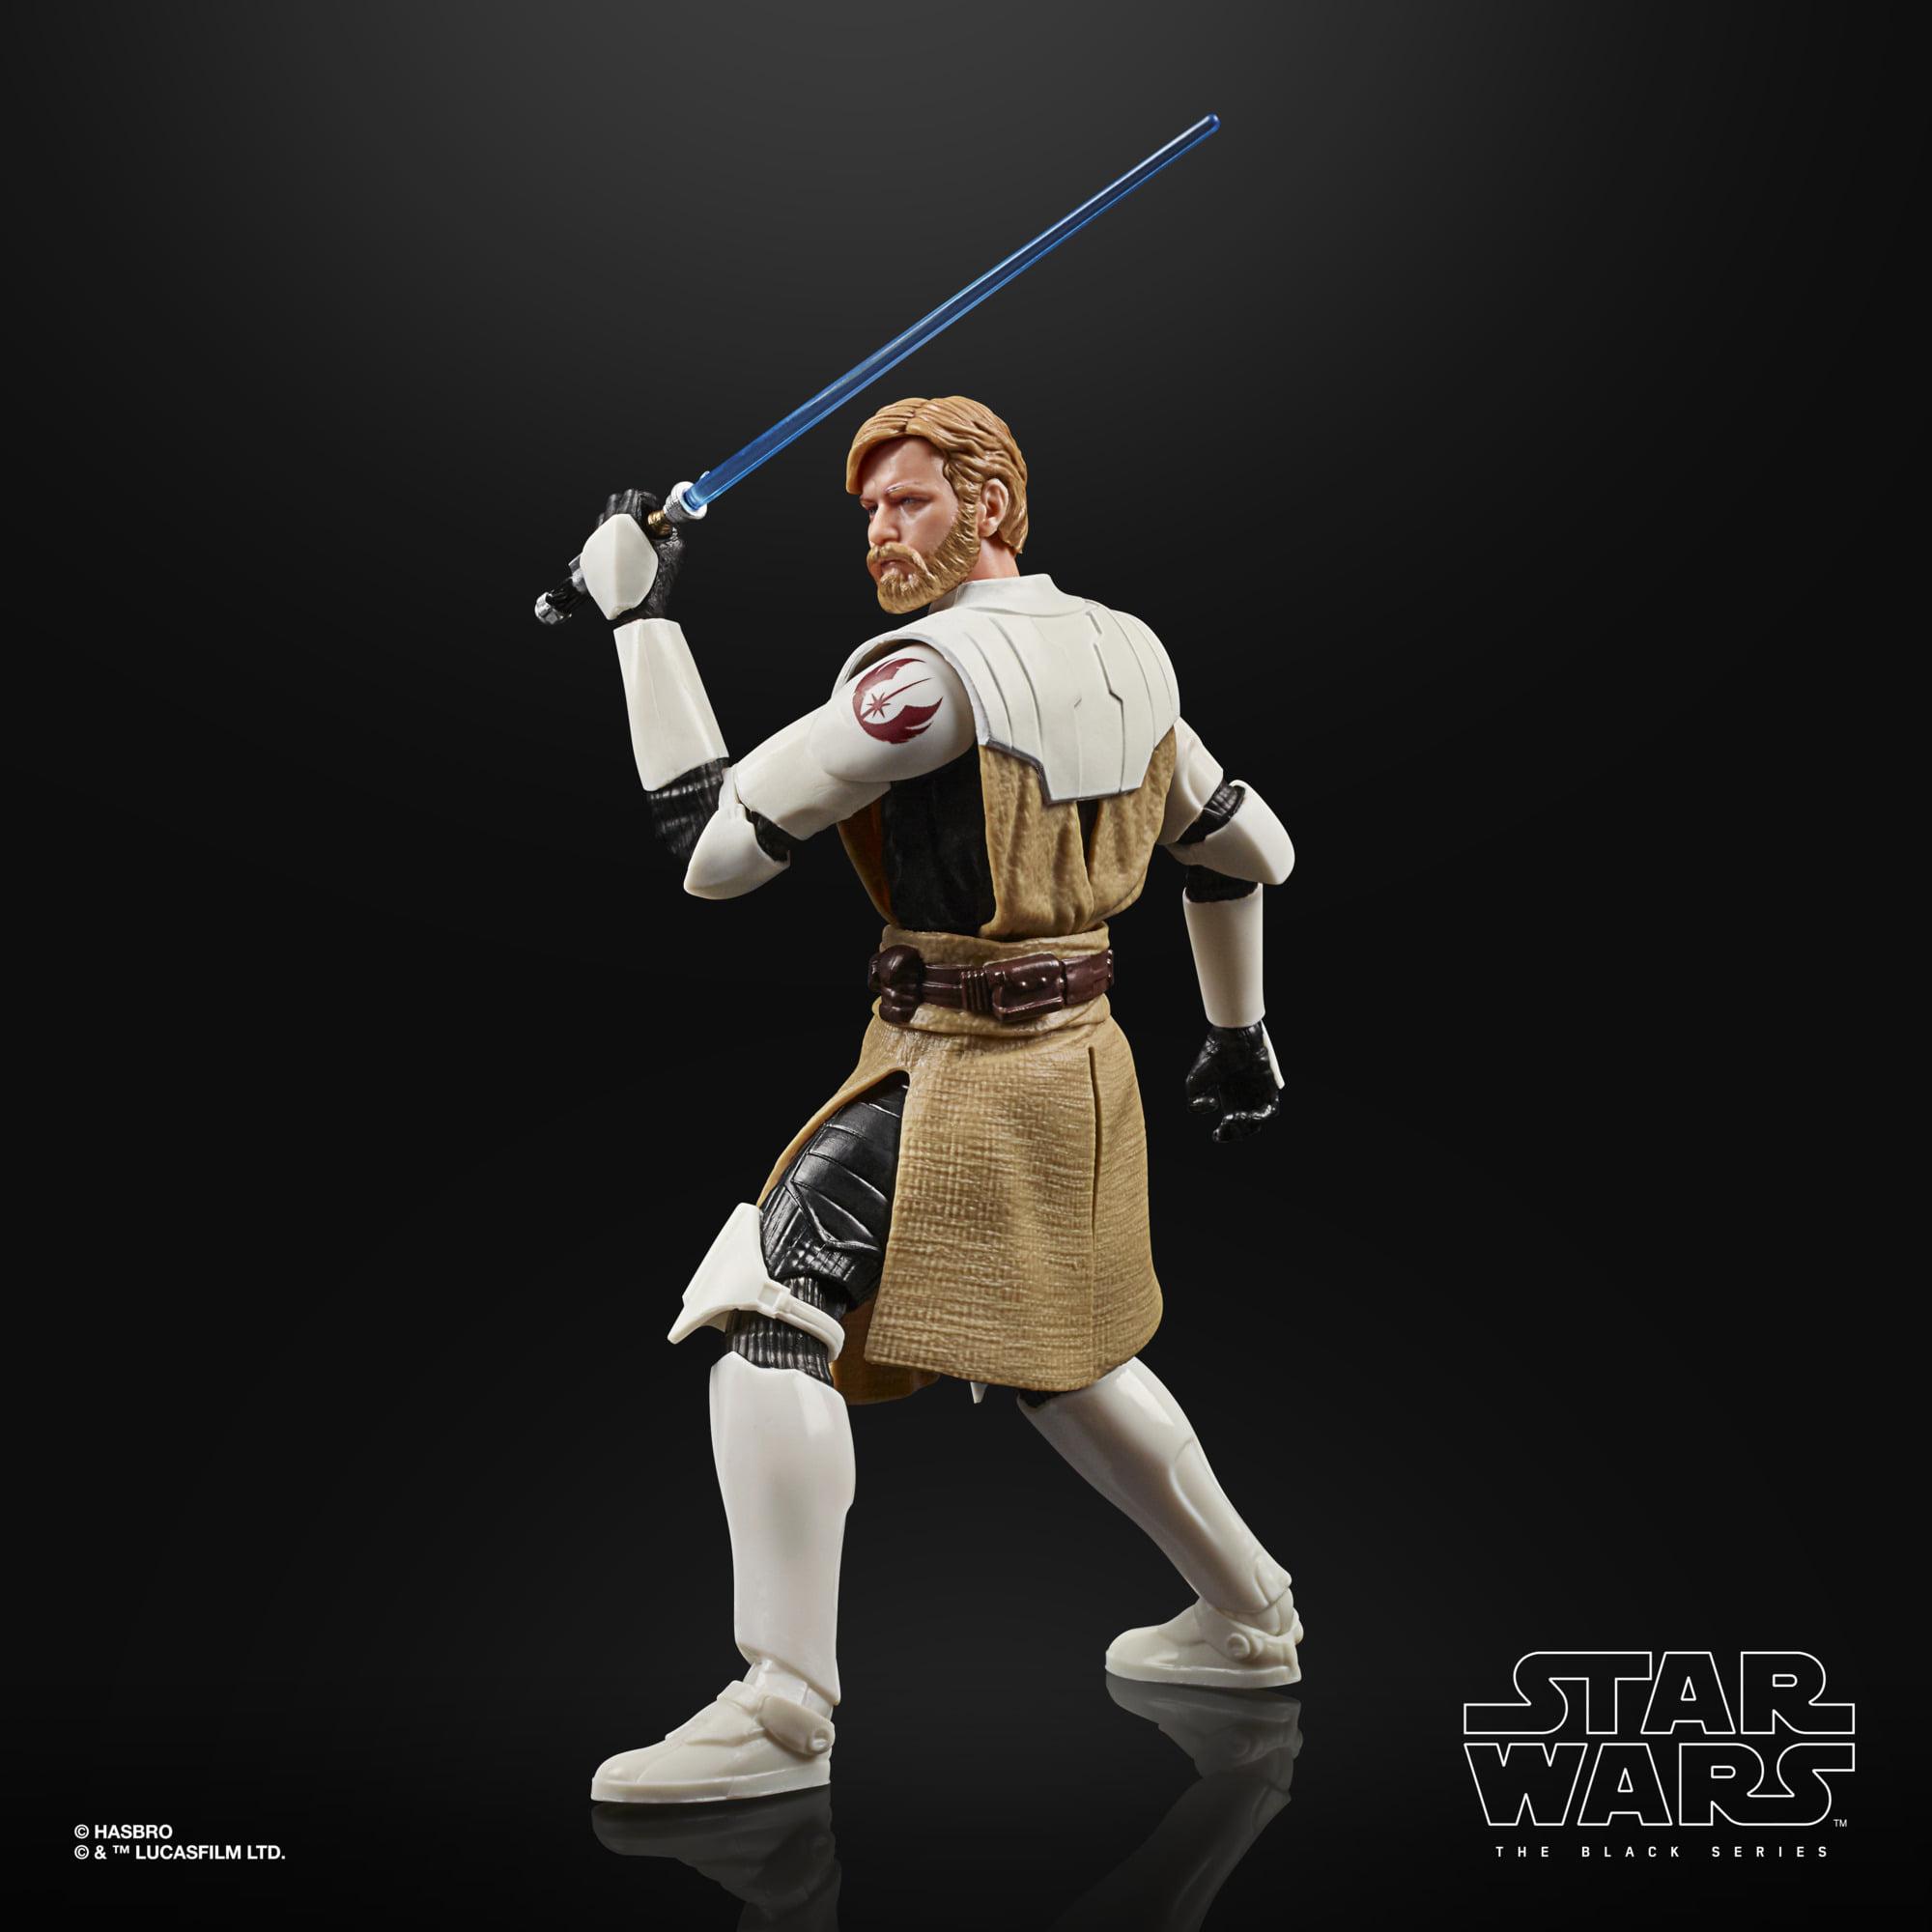 Black-Series-Obi-Wan-Kenobi-TCW-Lucasfilm-50th-Anniversary-Loose-5.jpg